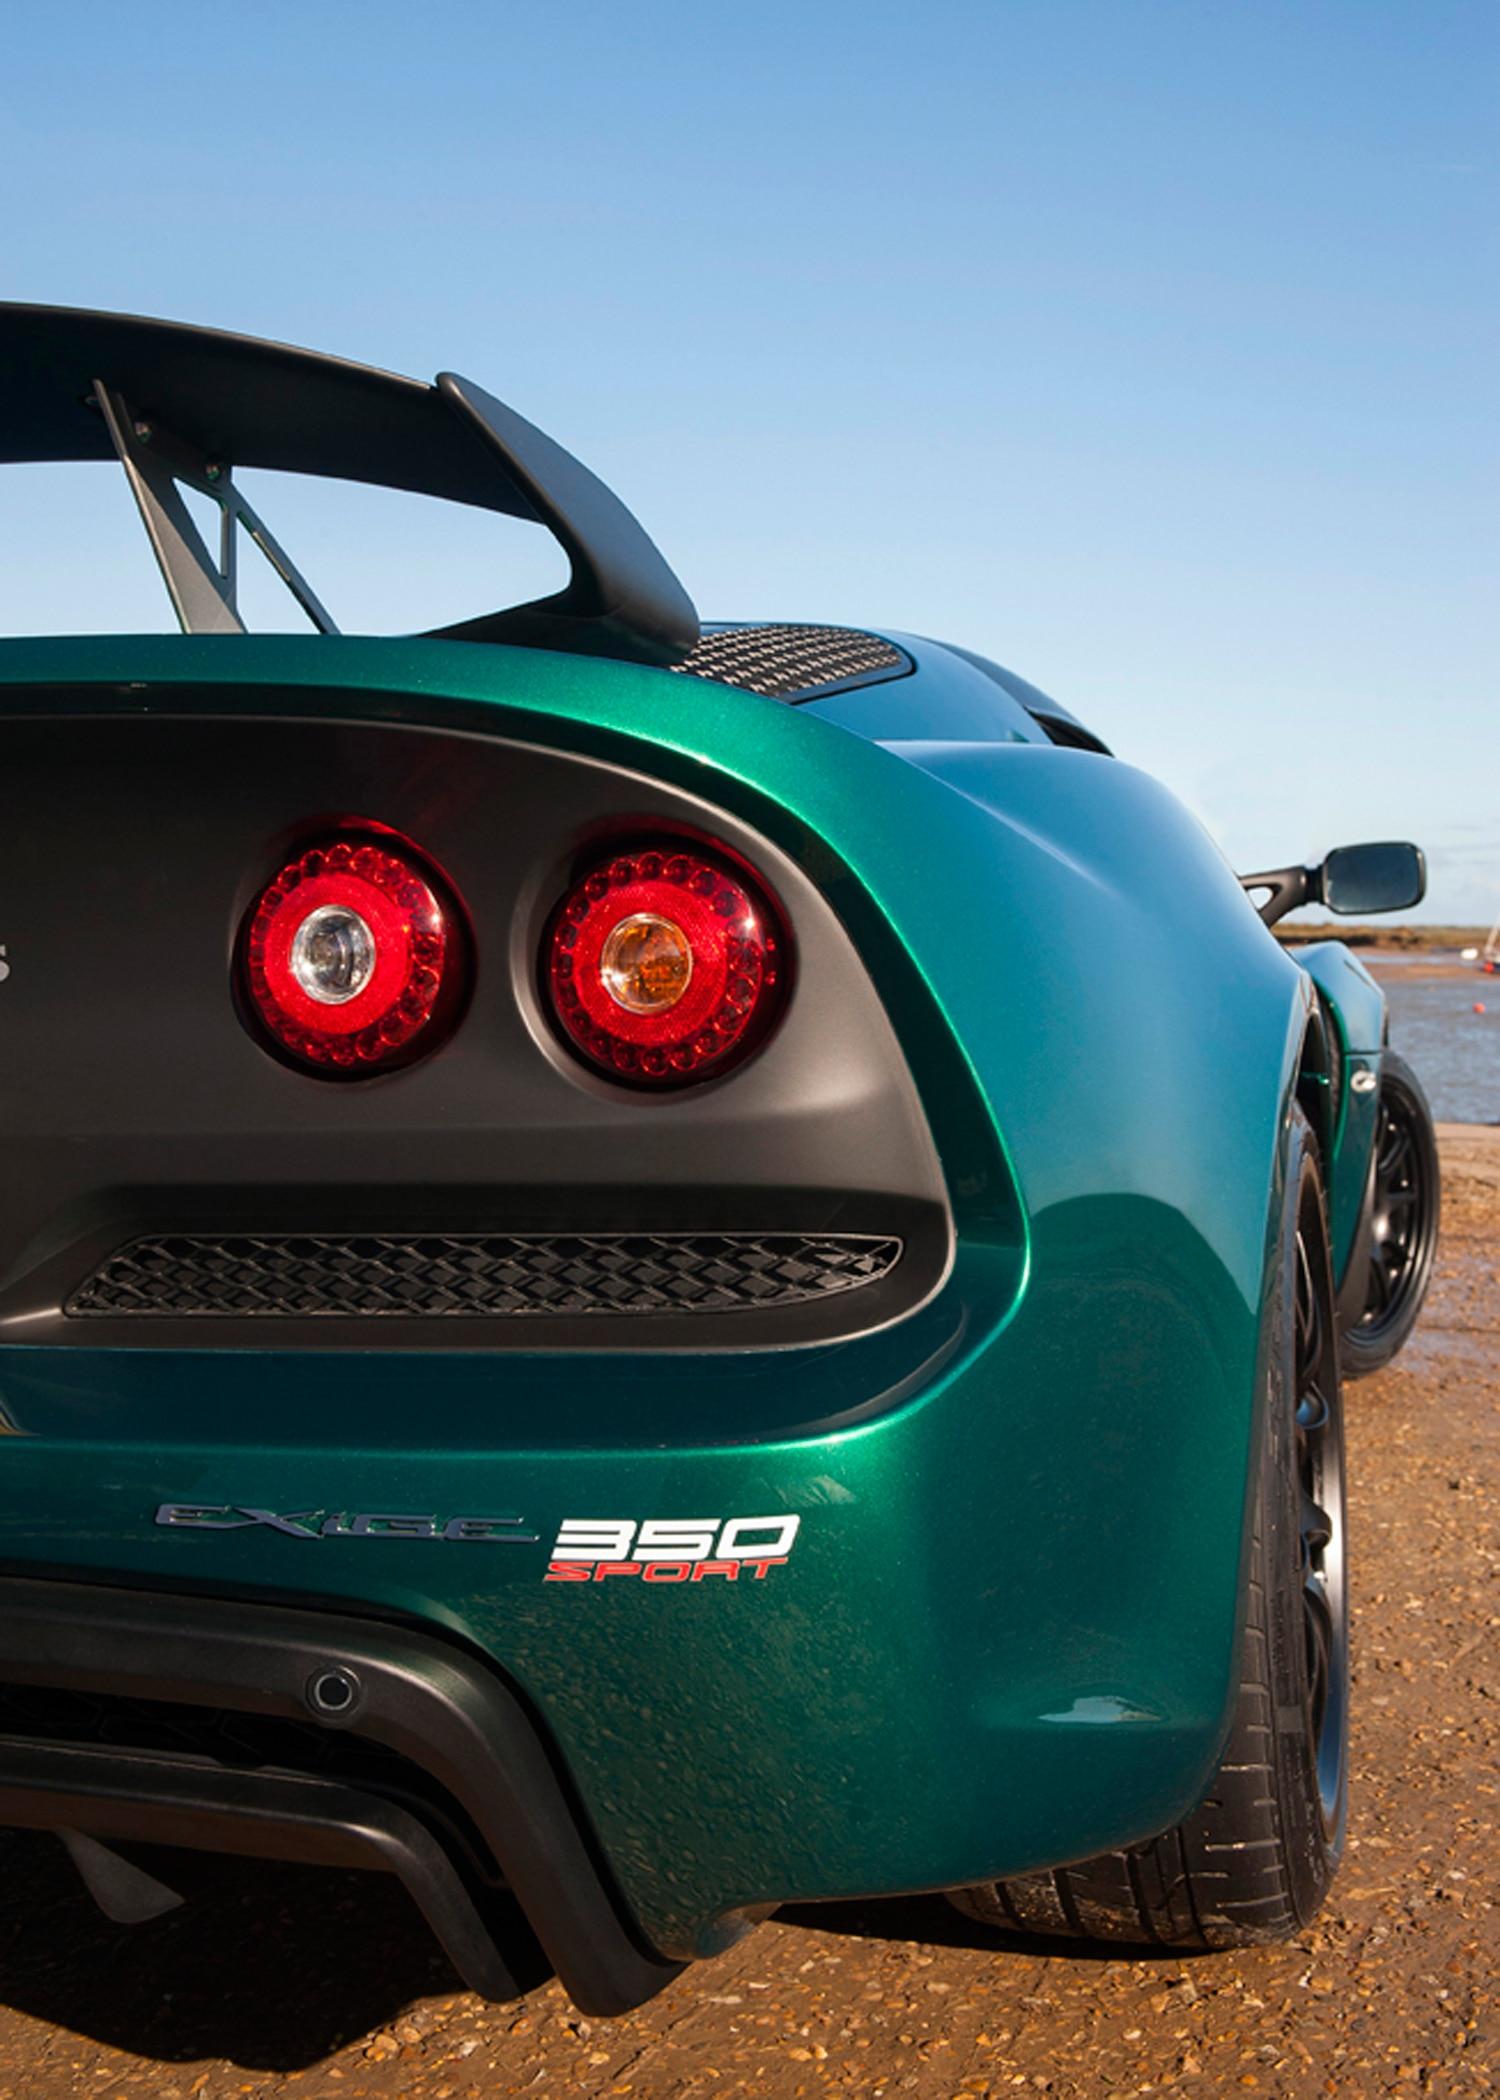 http://st.automobilemag.com/uploads/sites/11/2015/12/Lotus-Exige-Sport-350-rear-taillight.jpg